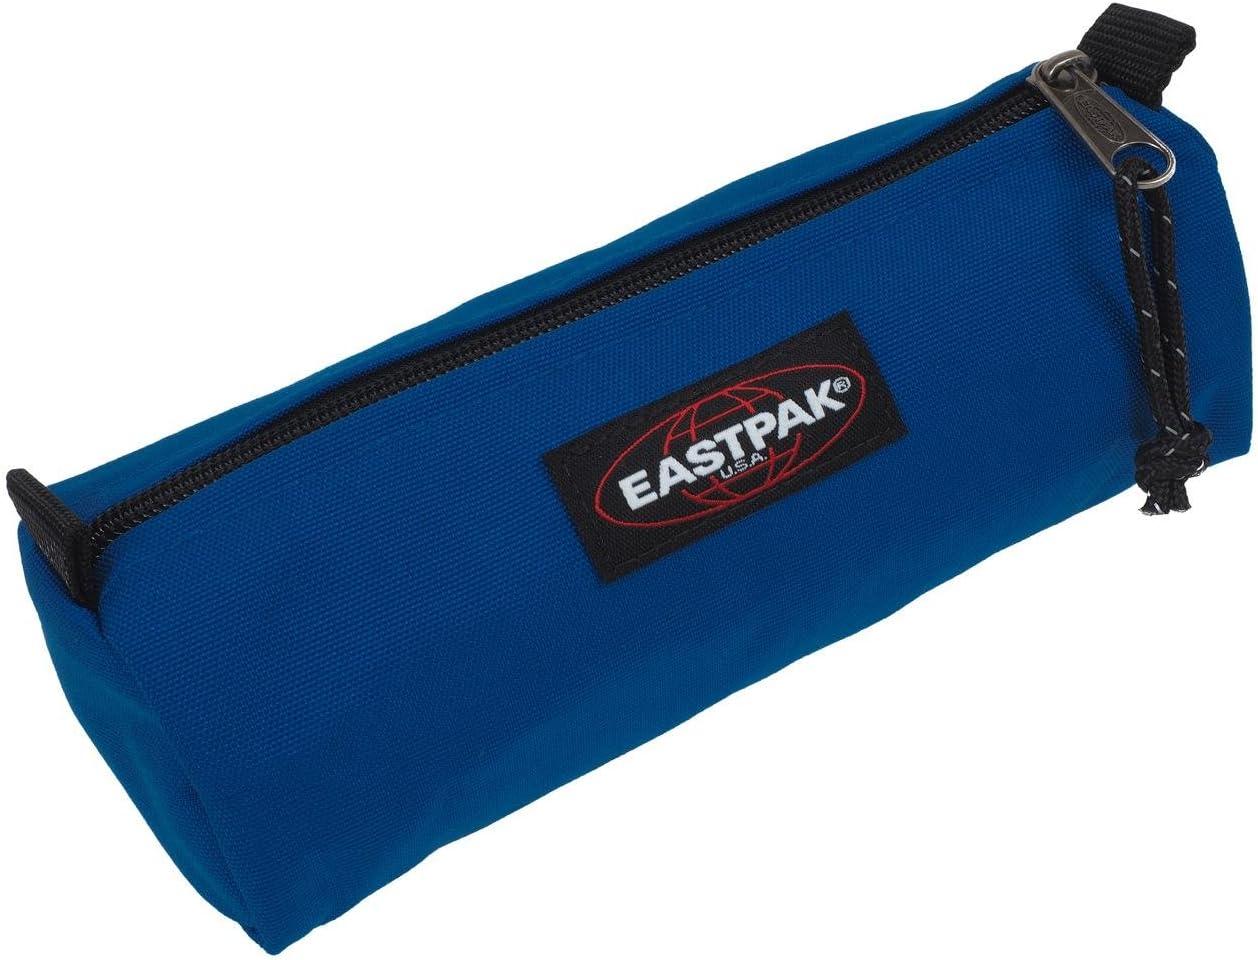 Eastpack Benchmark Single Funda para Mochila, 20 cm, Azul (Bonded Blue): Eastpak: Amazon.es: Equipaje